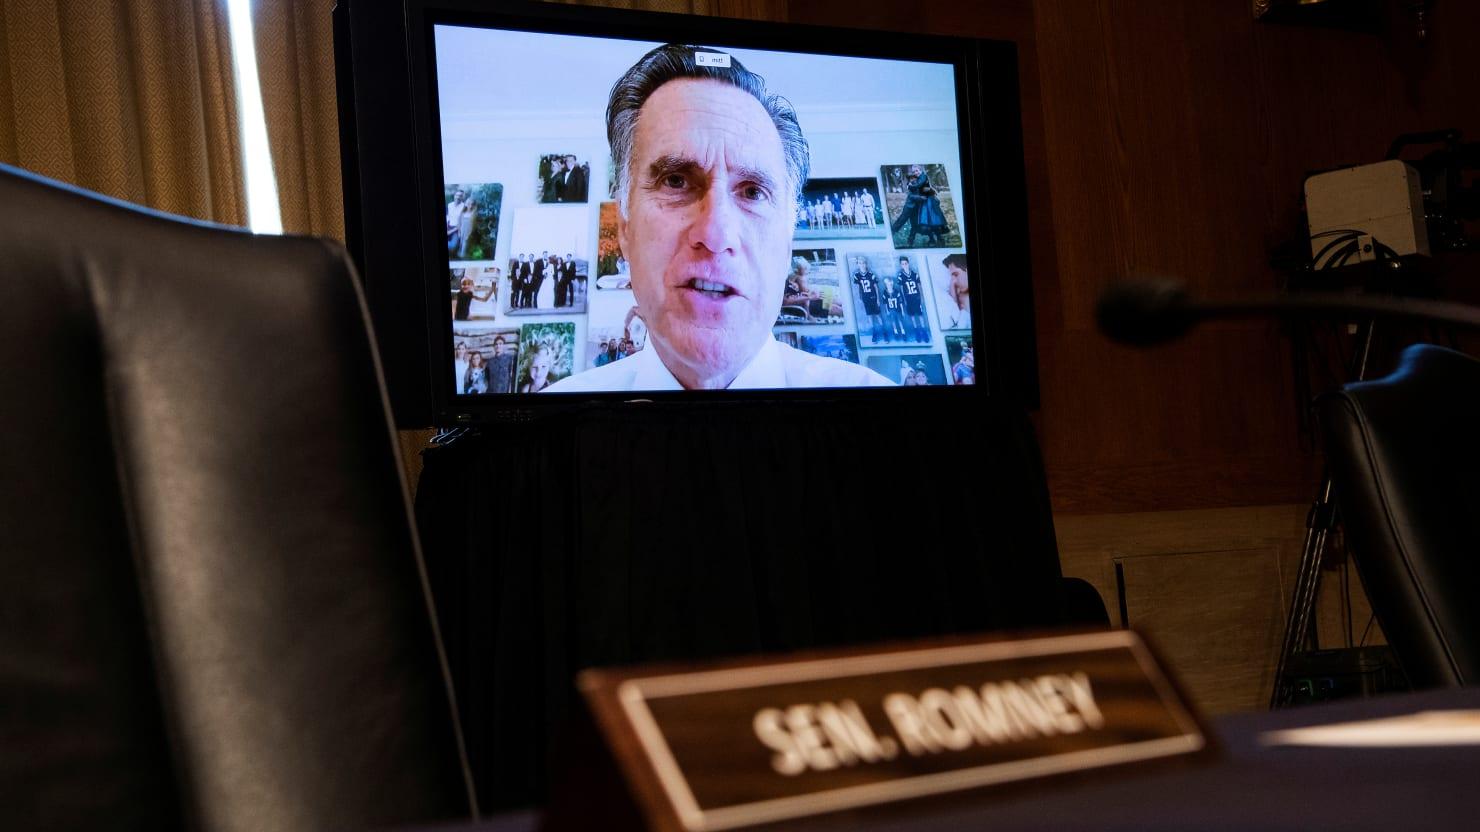 thedailybeast.com - Barbie Latza Nadeau - Mitt Romney Accuses Donald Trump of 'Unprecedented, Historic Corruption' for Pardoning Roger Stone